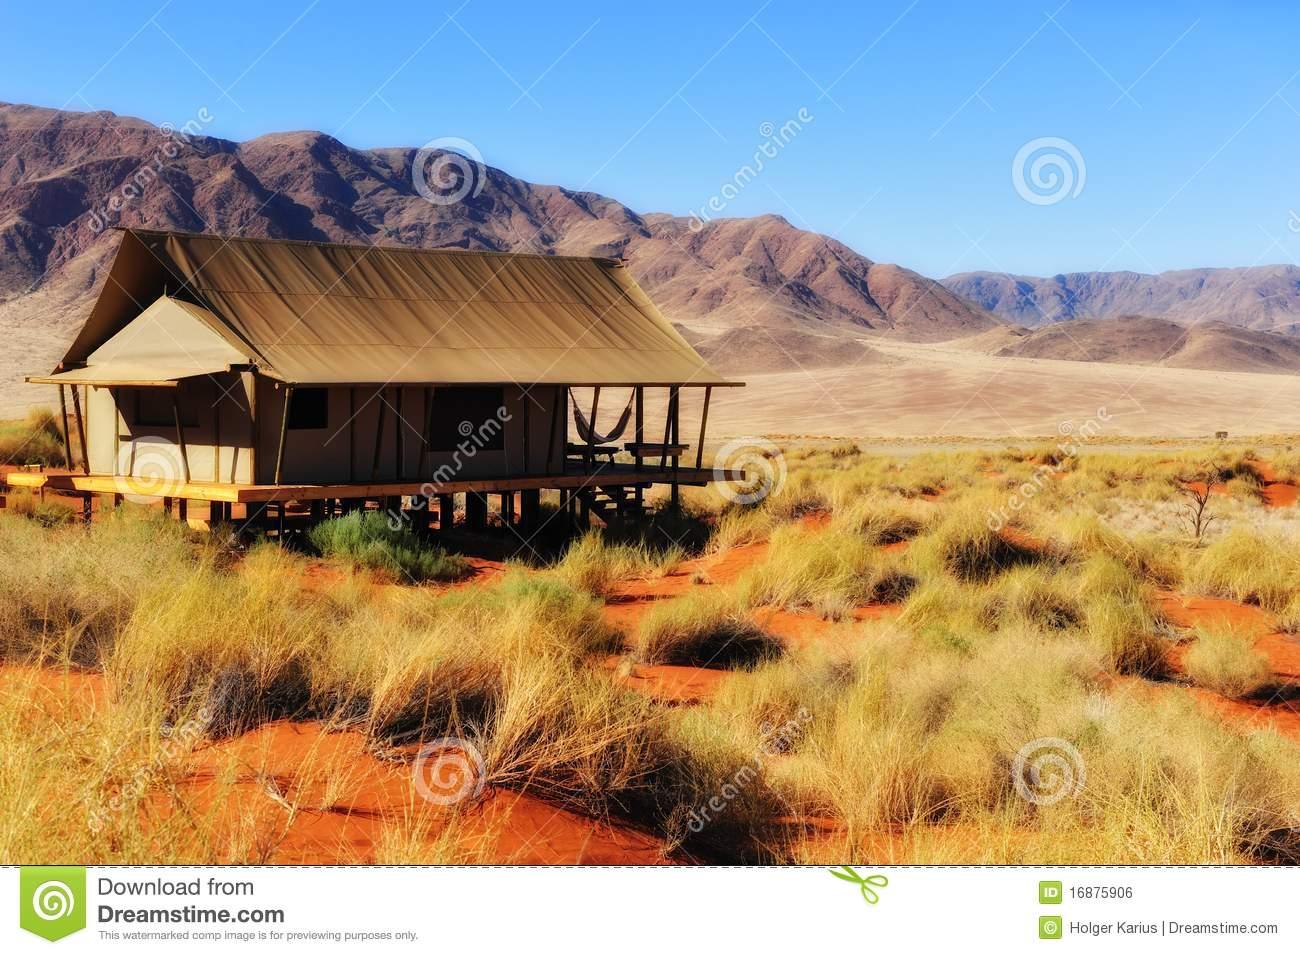 Safari Tent In The Namib Desert (Namibia) Royalty Free Stock Image.